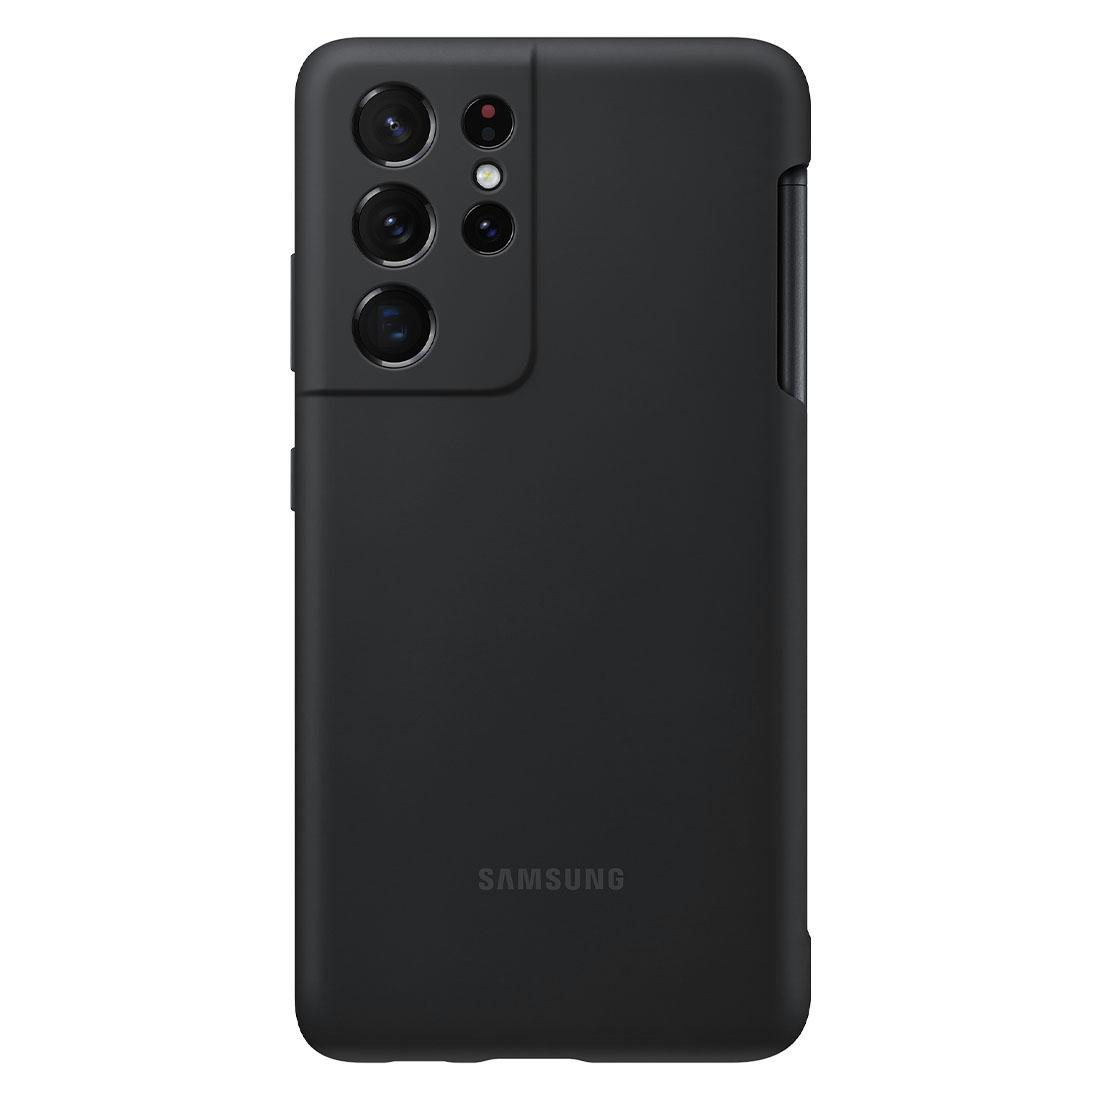 Capa Original Samsung Silicone com S Pen Galaxy S21 Ultra 6.8 Pol G999  - HARS